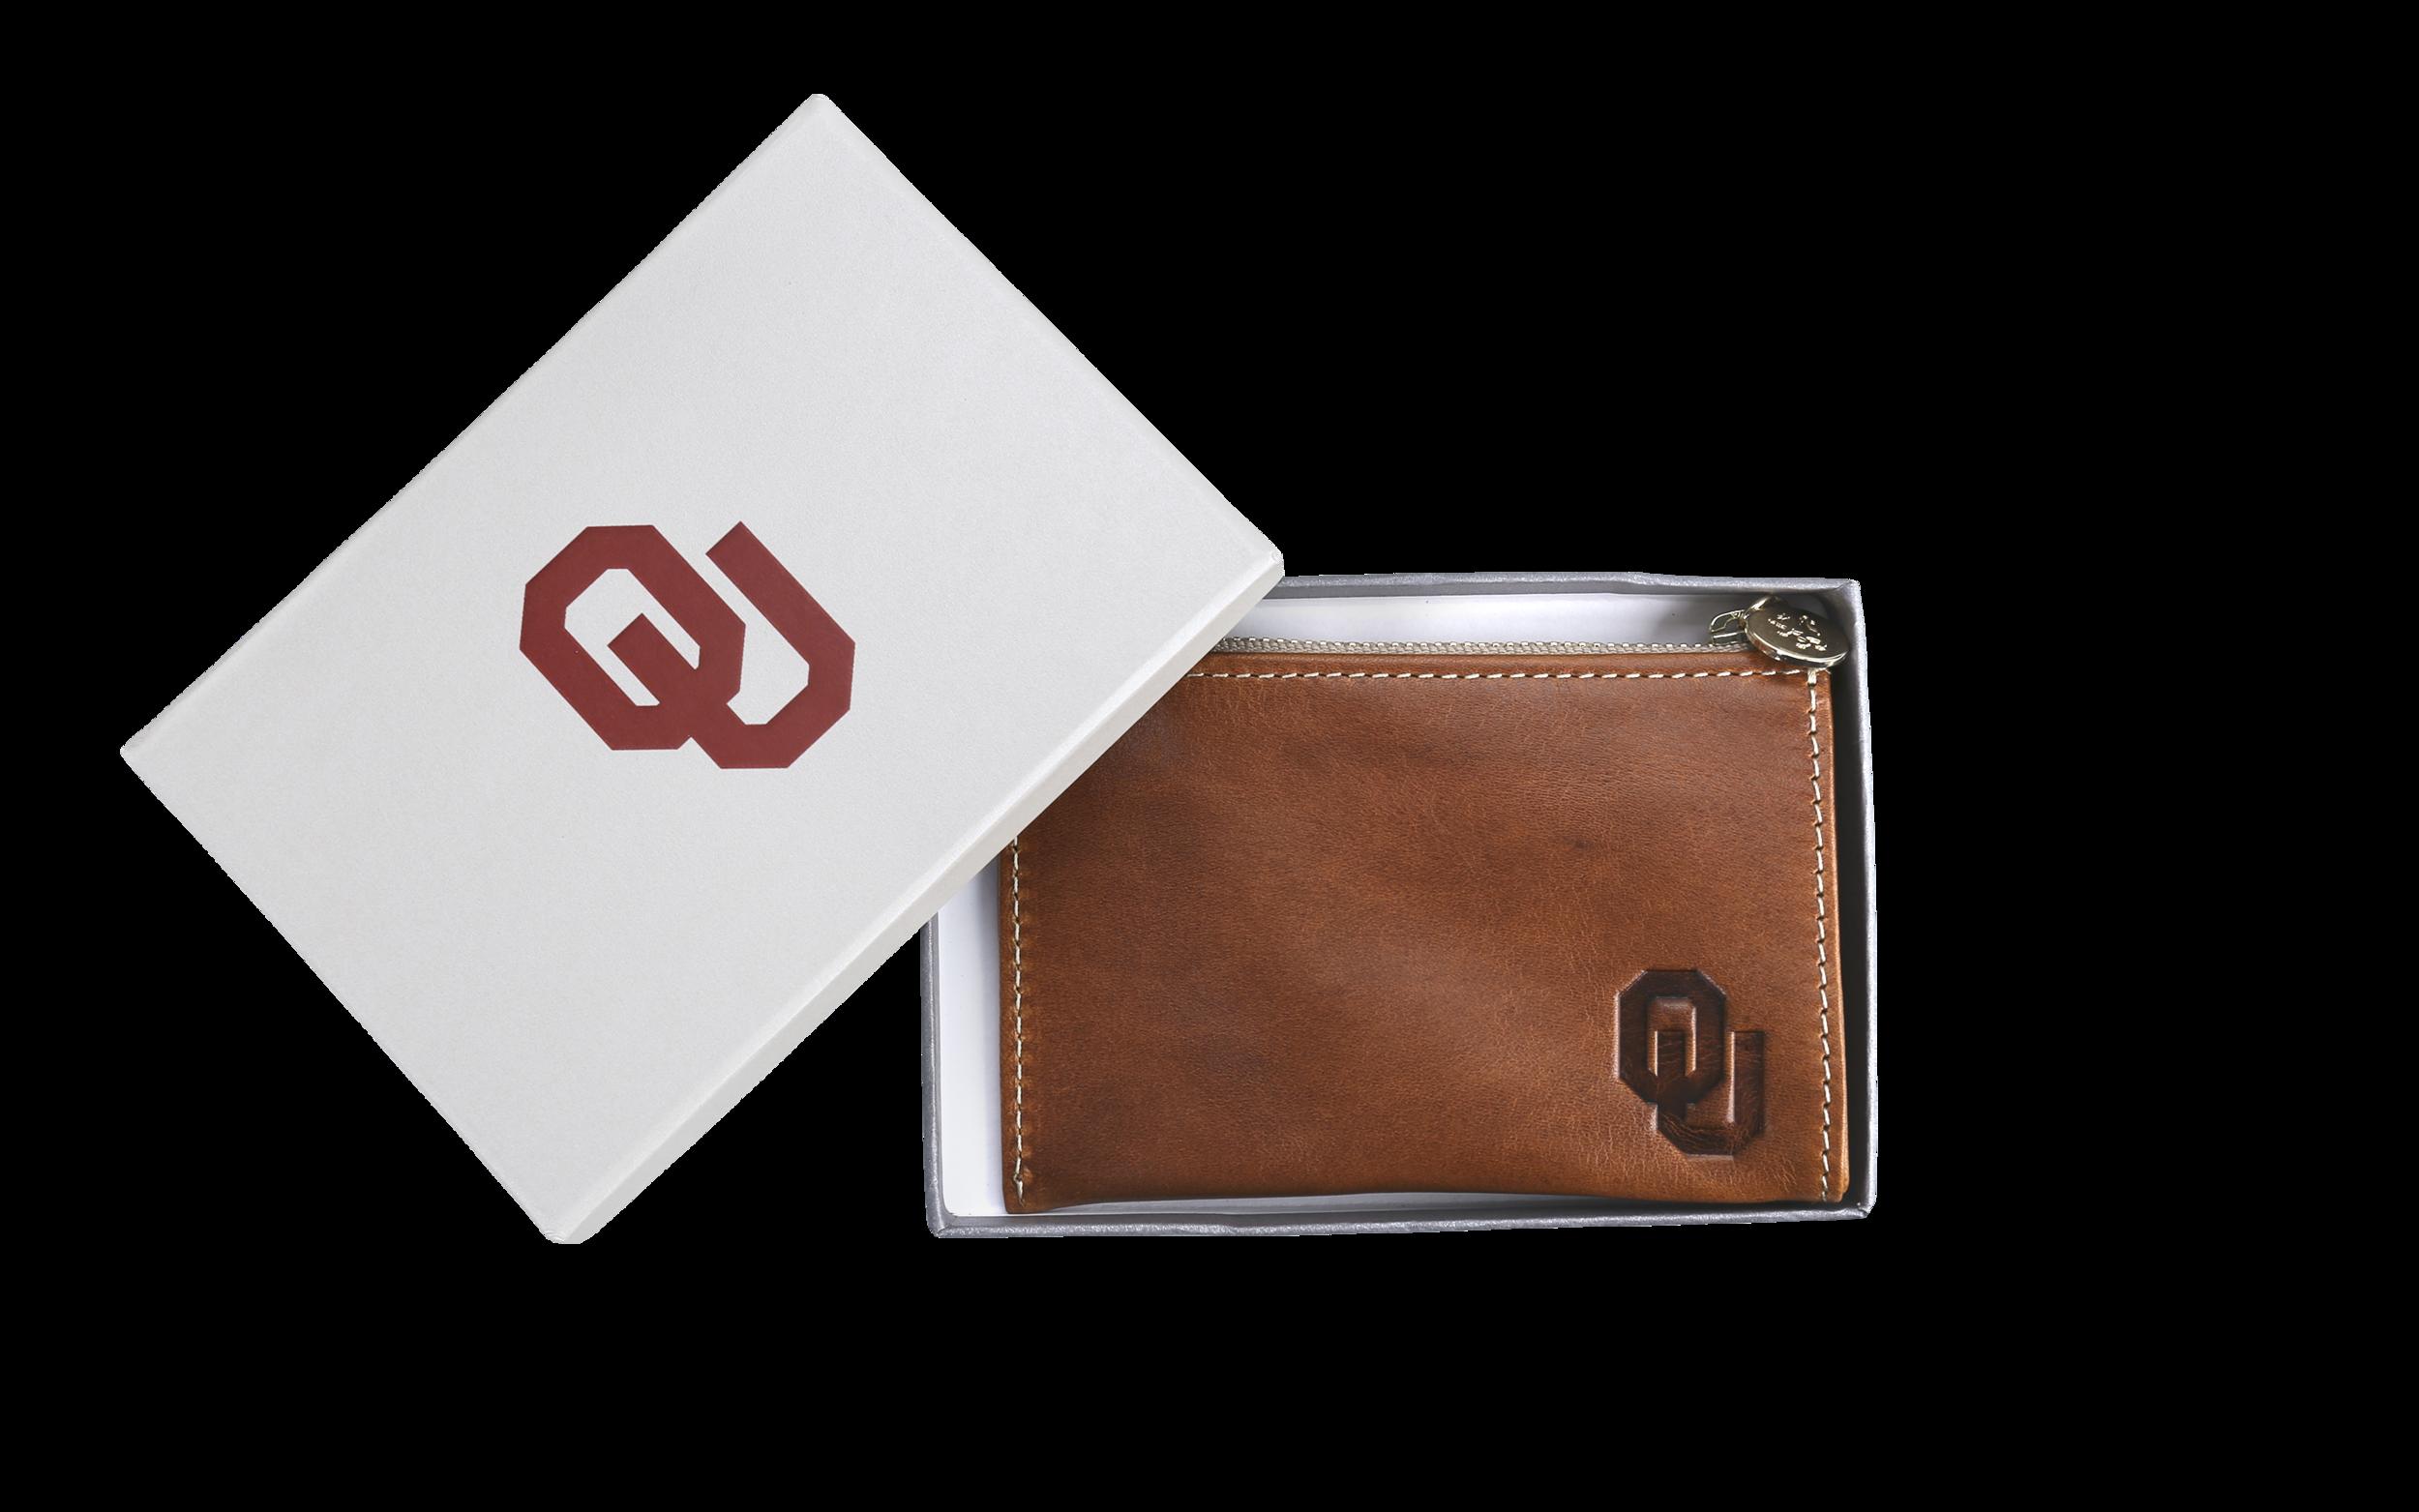 ou ladies wallet in box.png